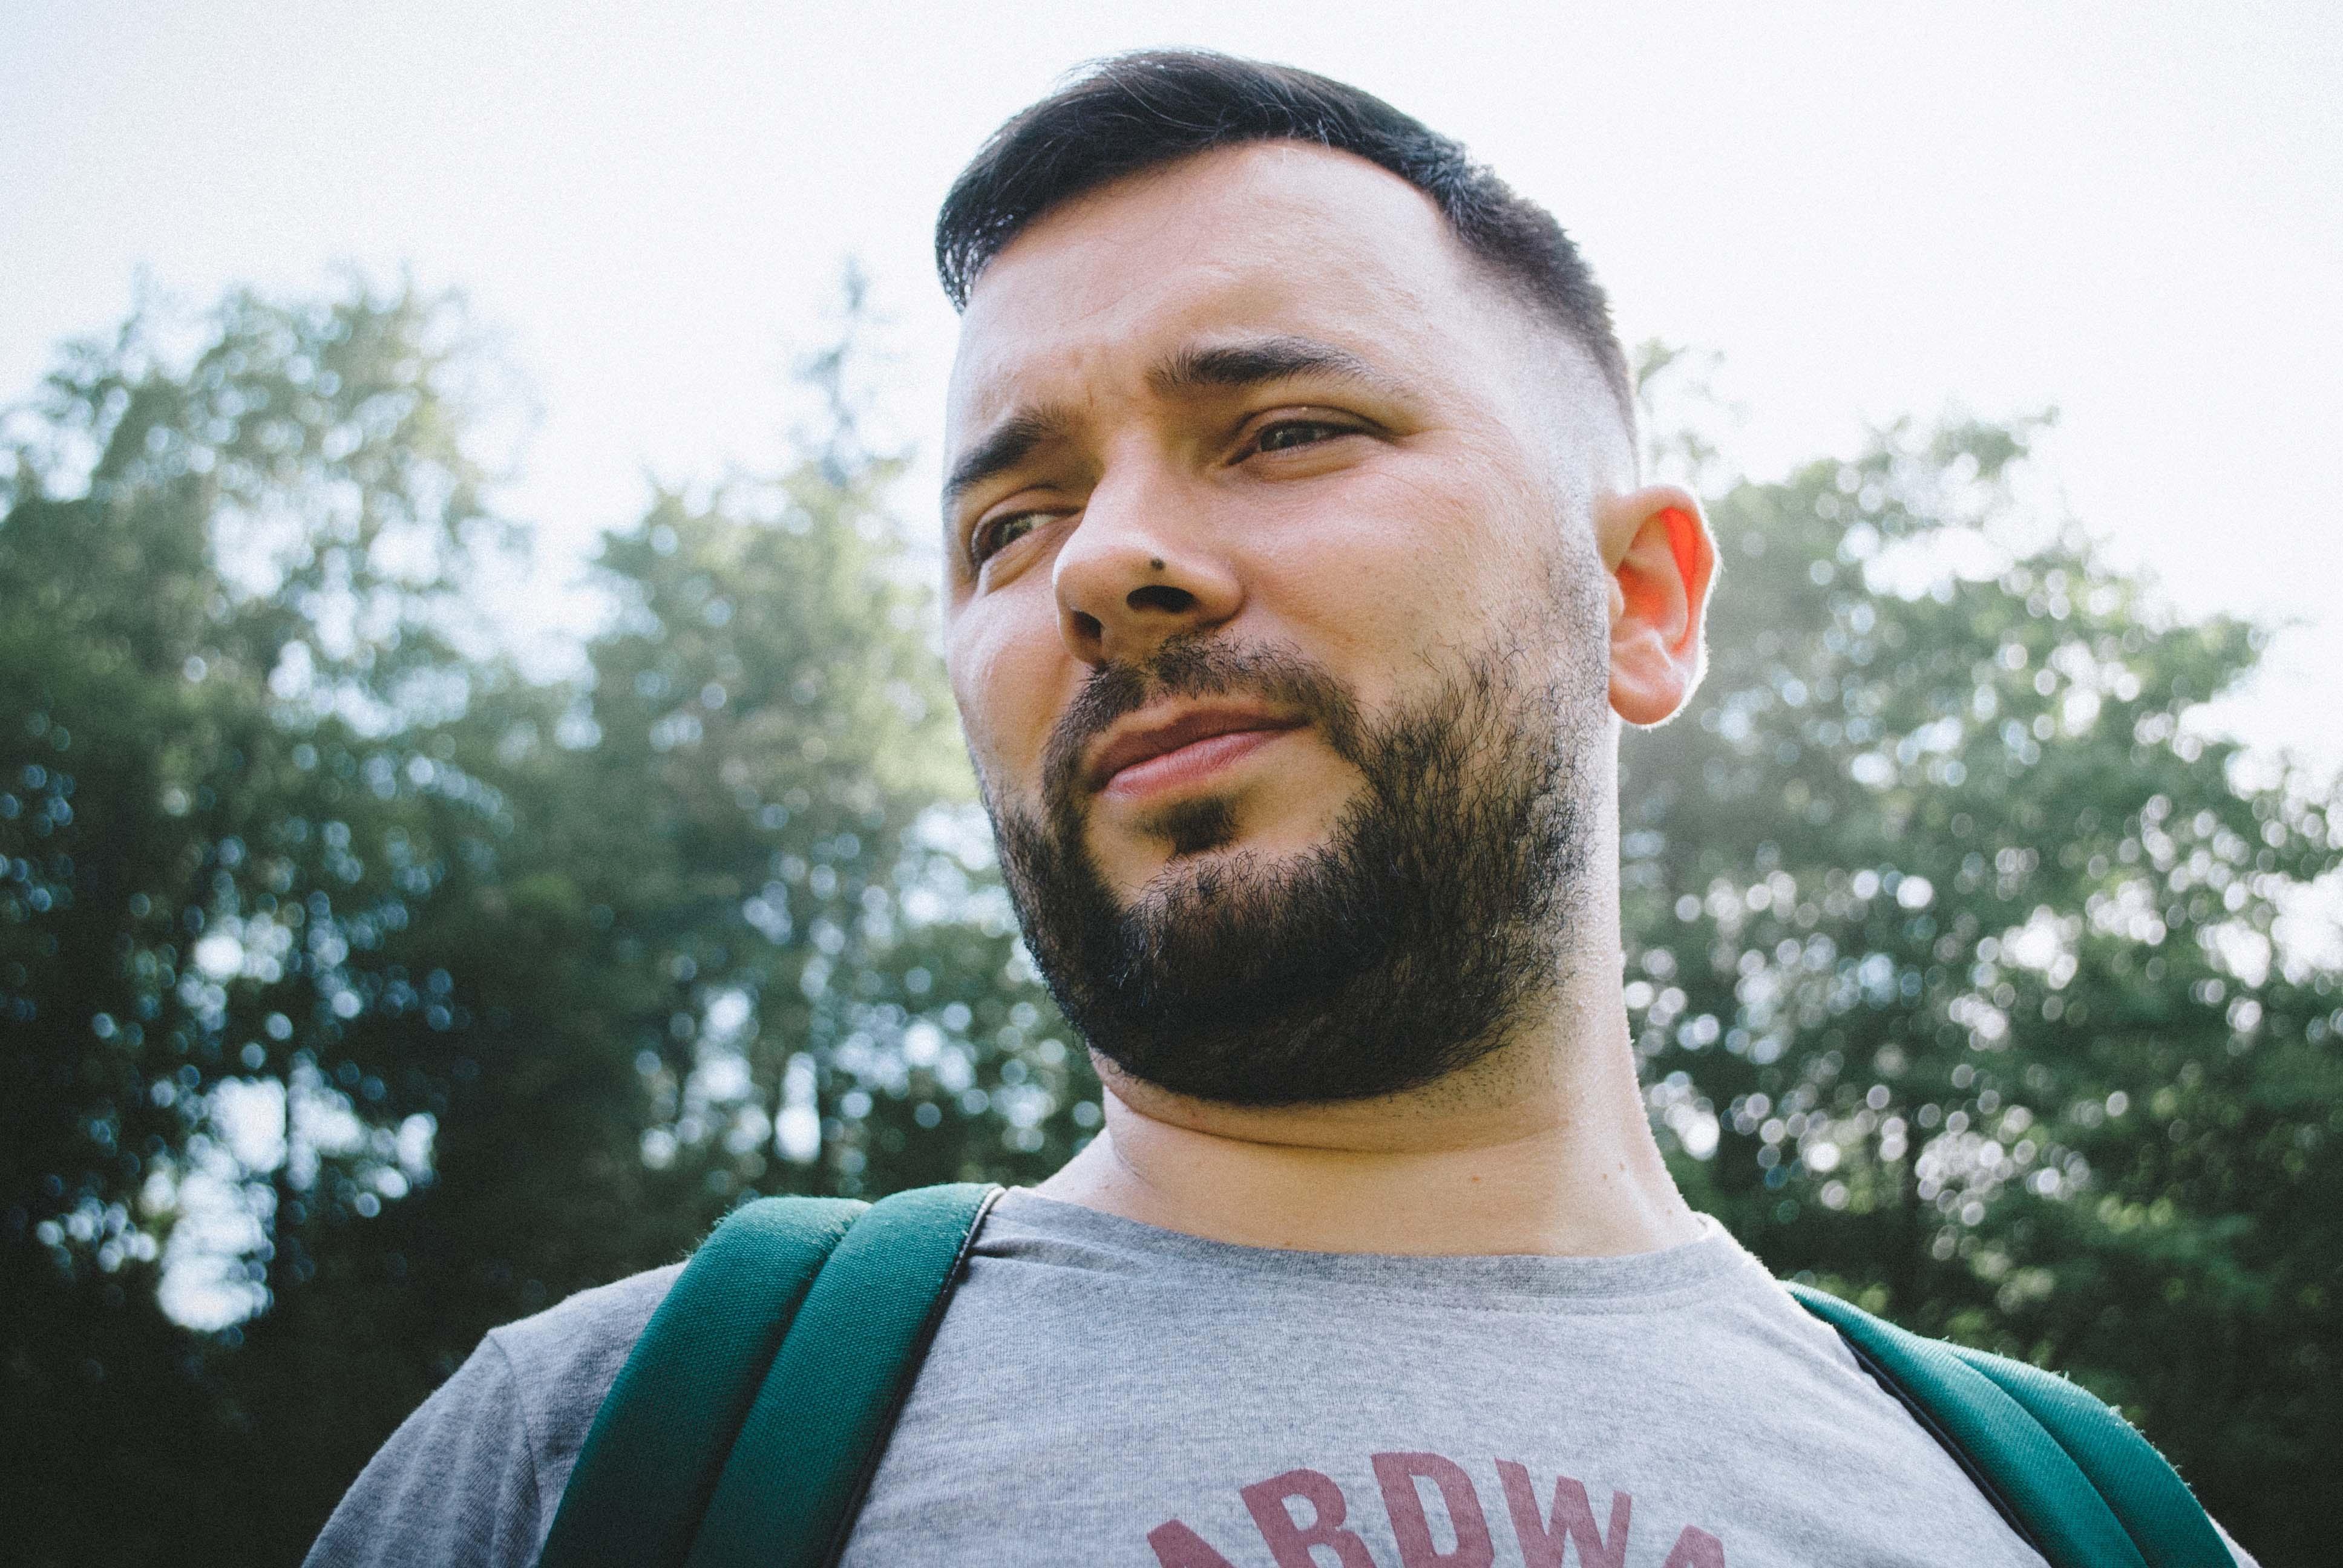 Go to Yuriy Kleymenov's profile